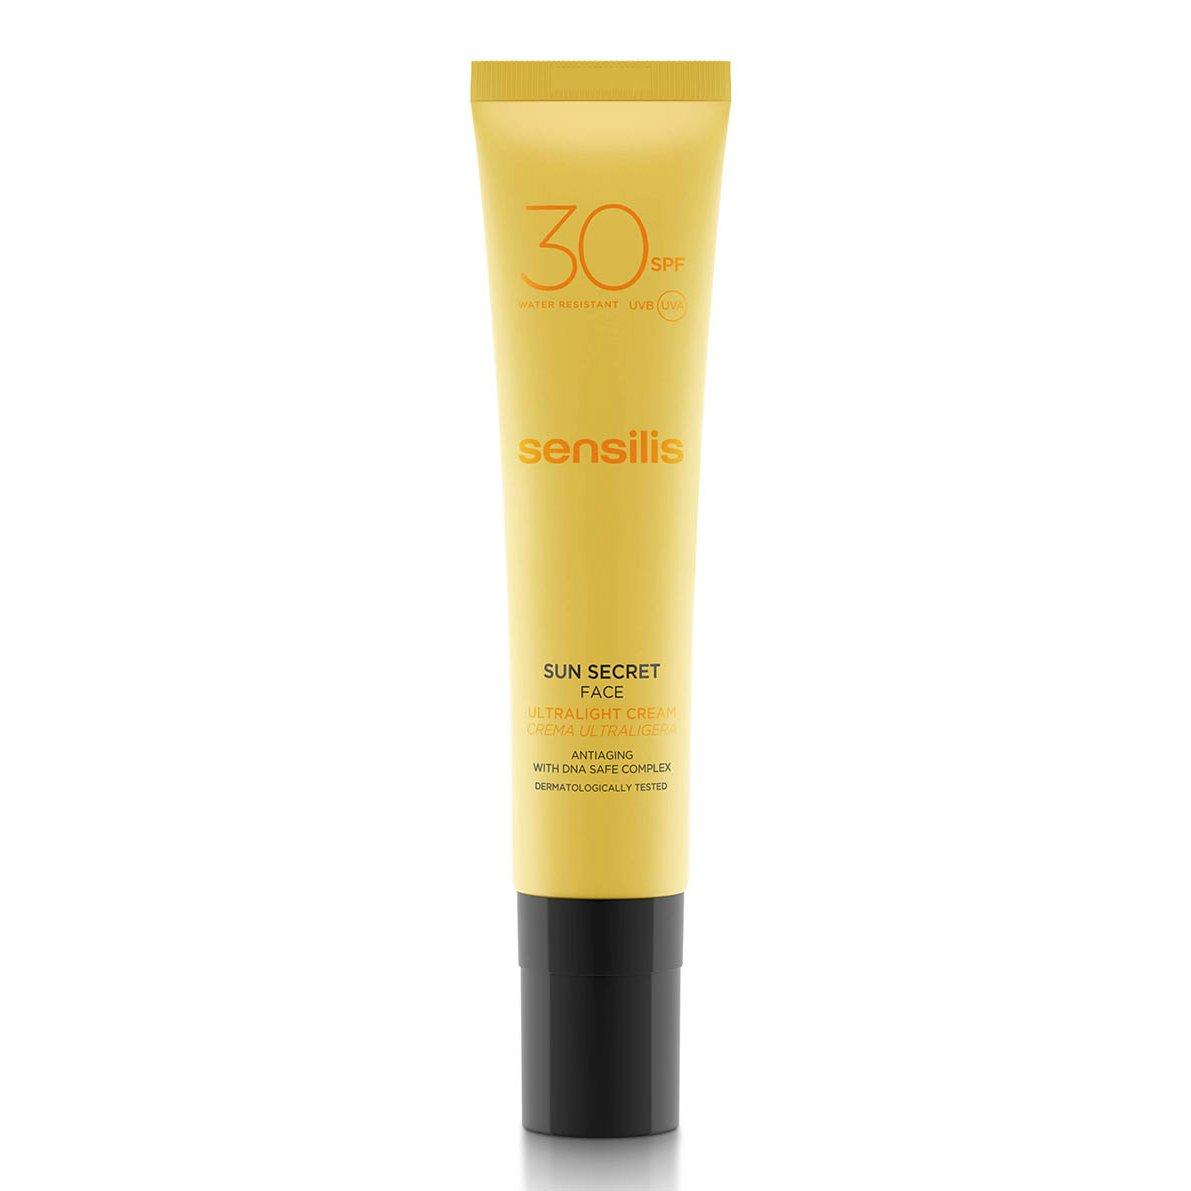 Sensilis Sun Secret Crema Ultraligera Protector Solar Facial SPF30-40 ml DERMOFARM D30022990